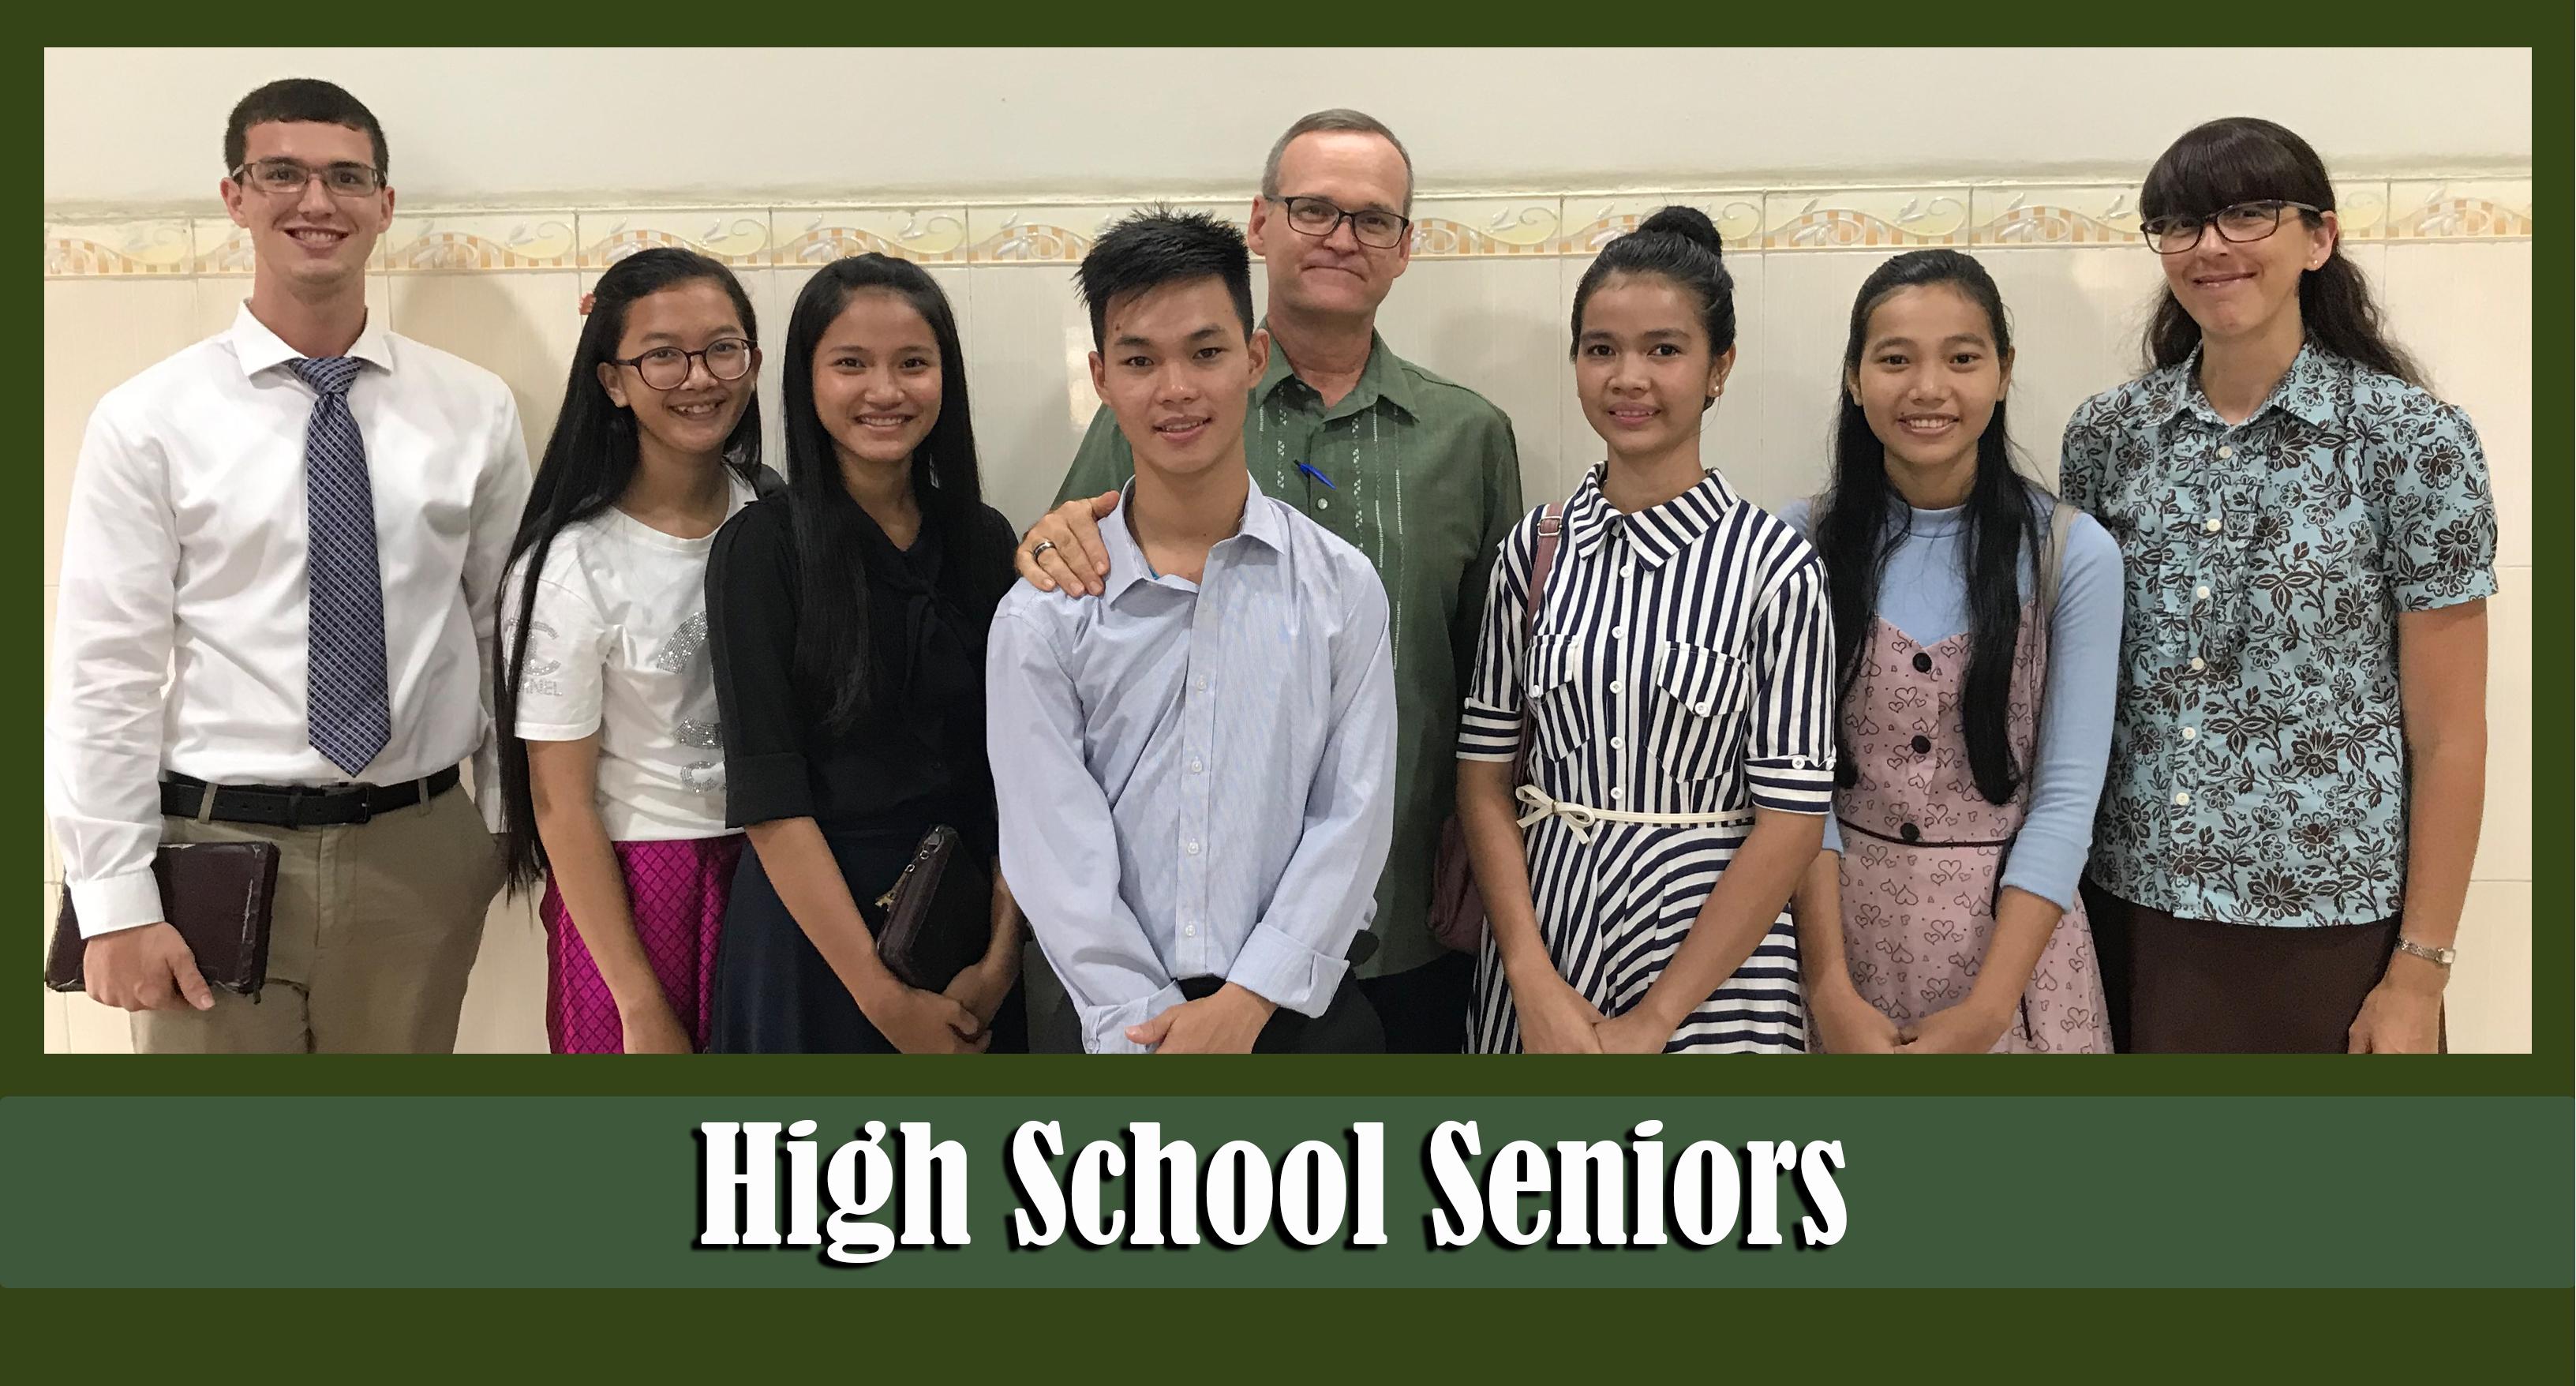 8.25.19 high school seniors